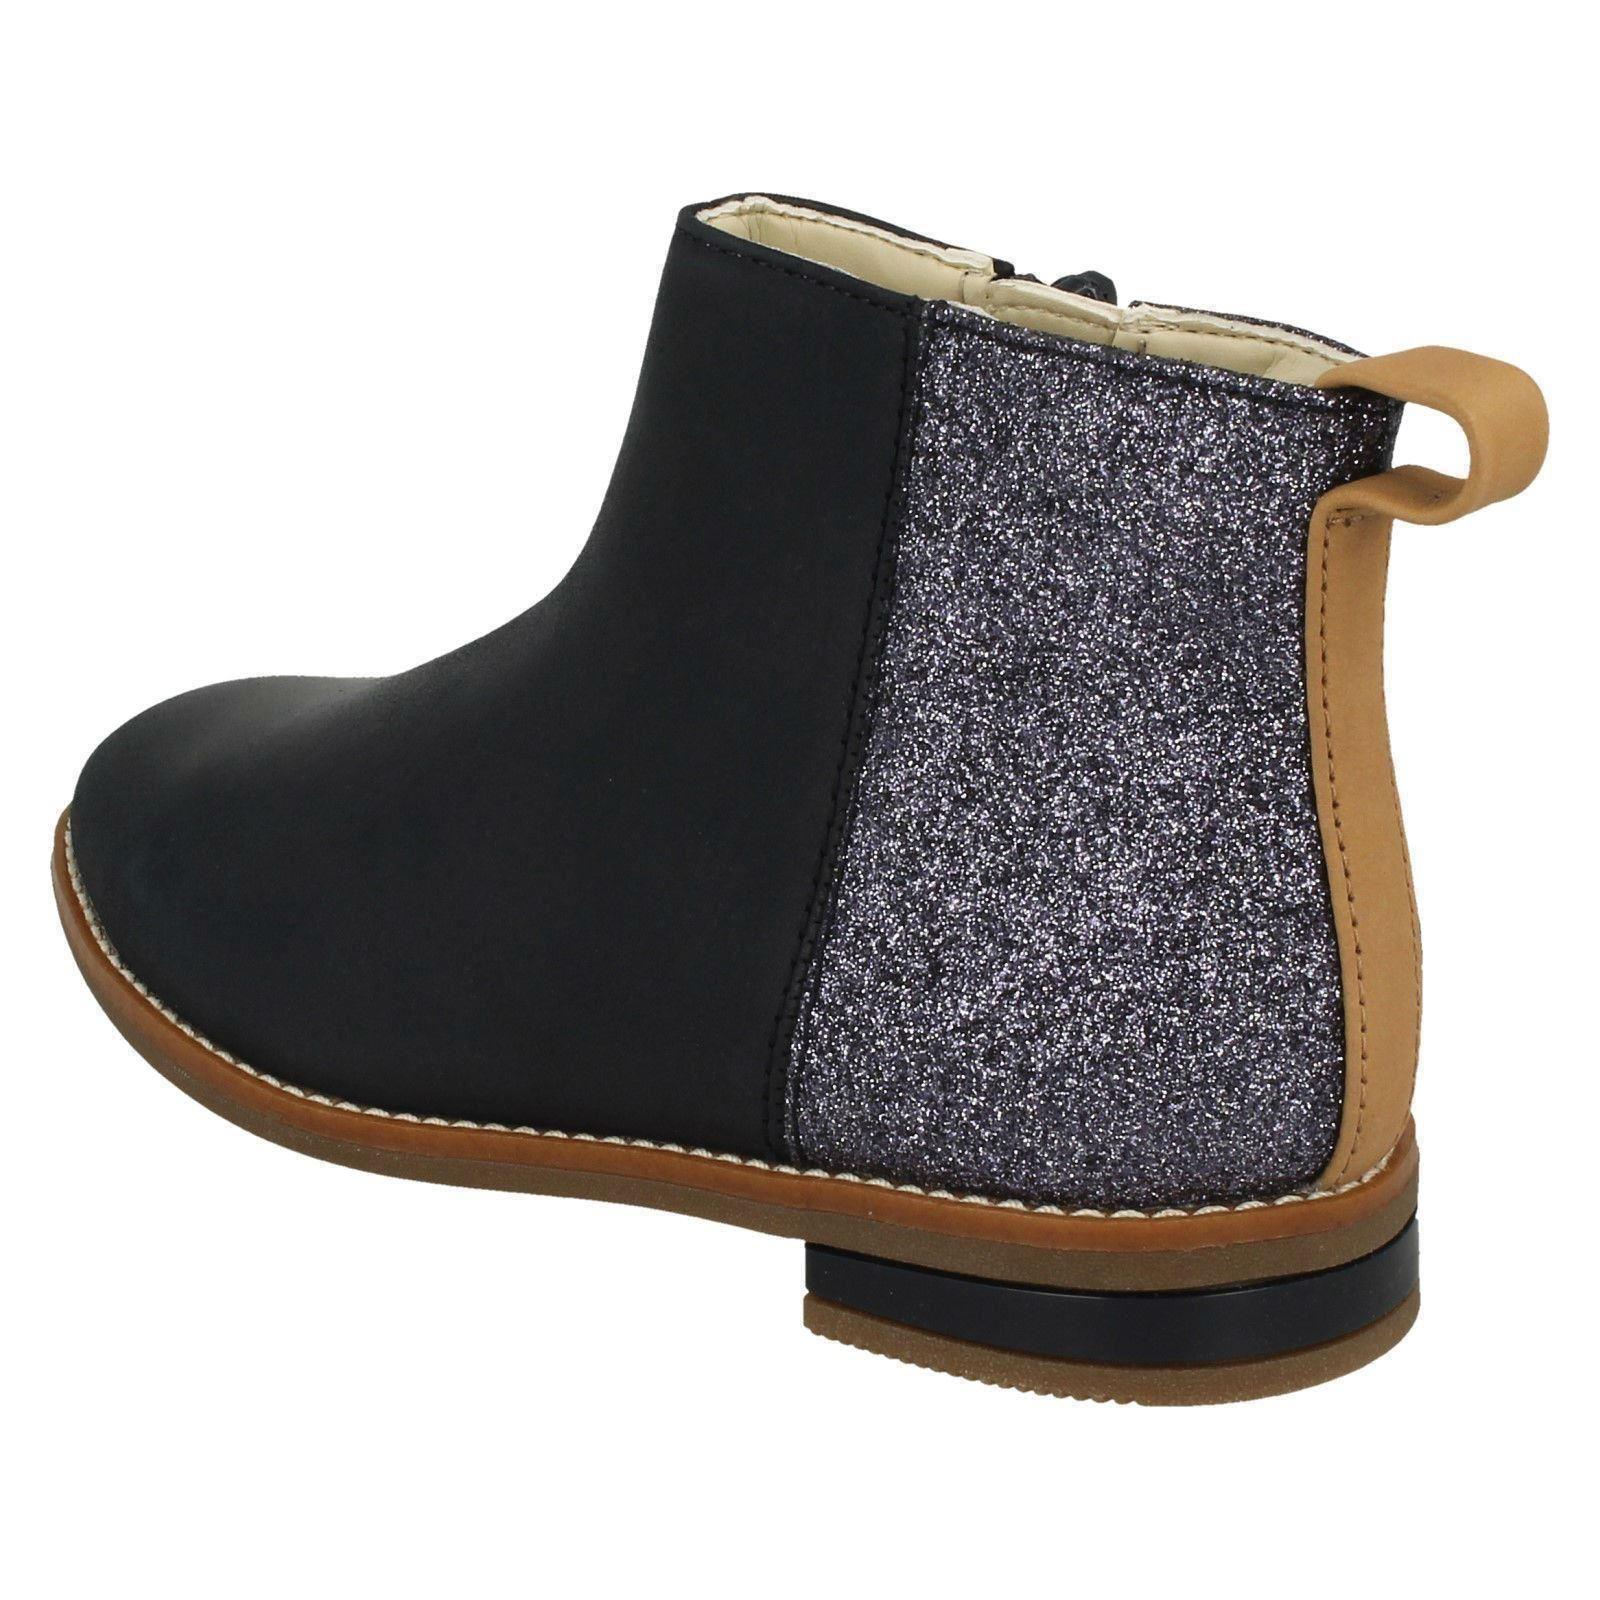 Clarks Girls Smart Ankle Boots /'Drew Fun/'